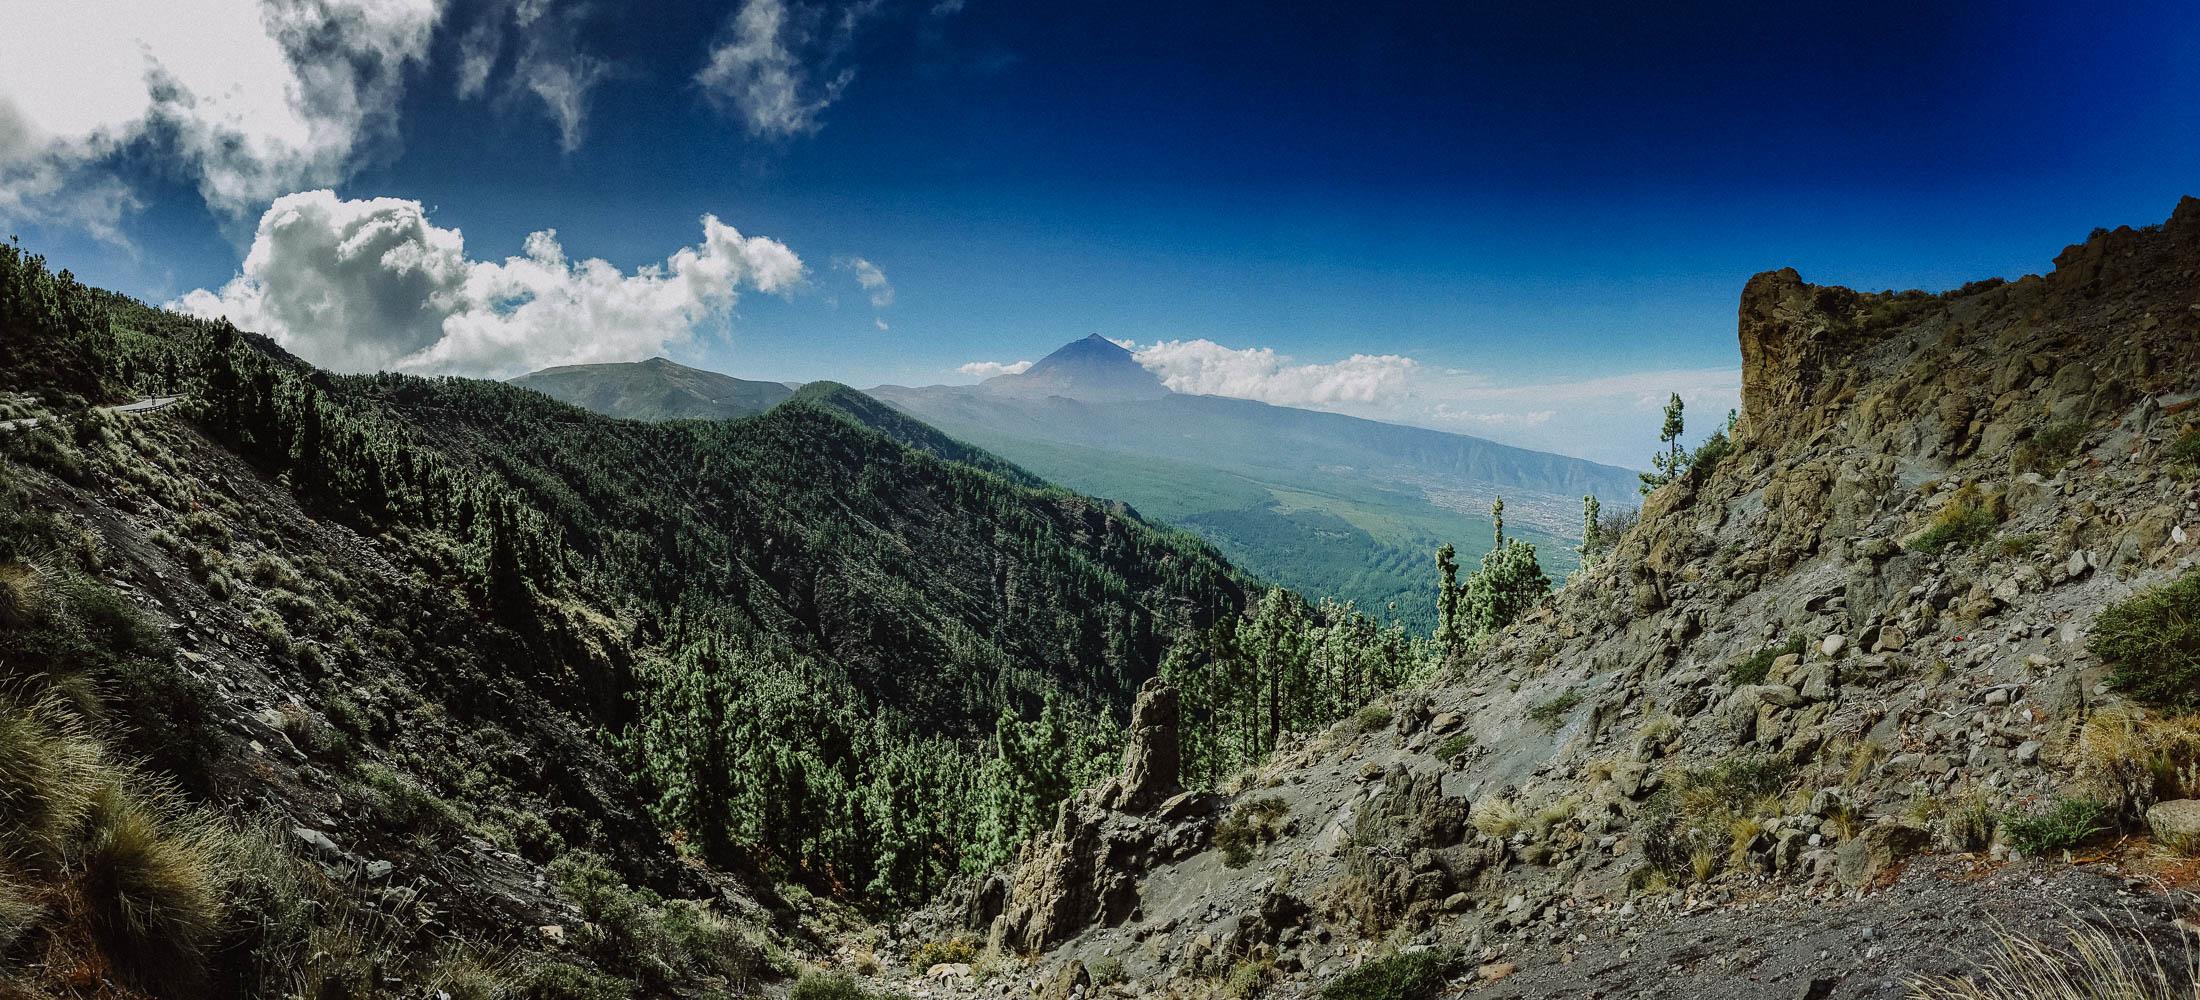 teneriffa-landscape-3910.jpg